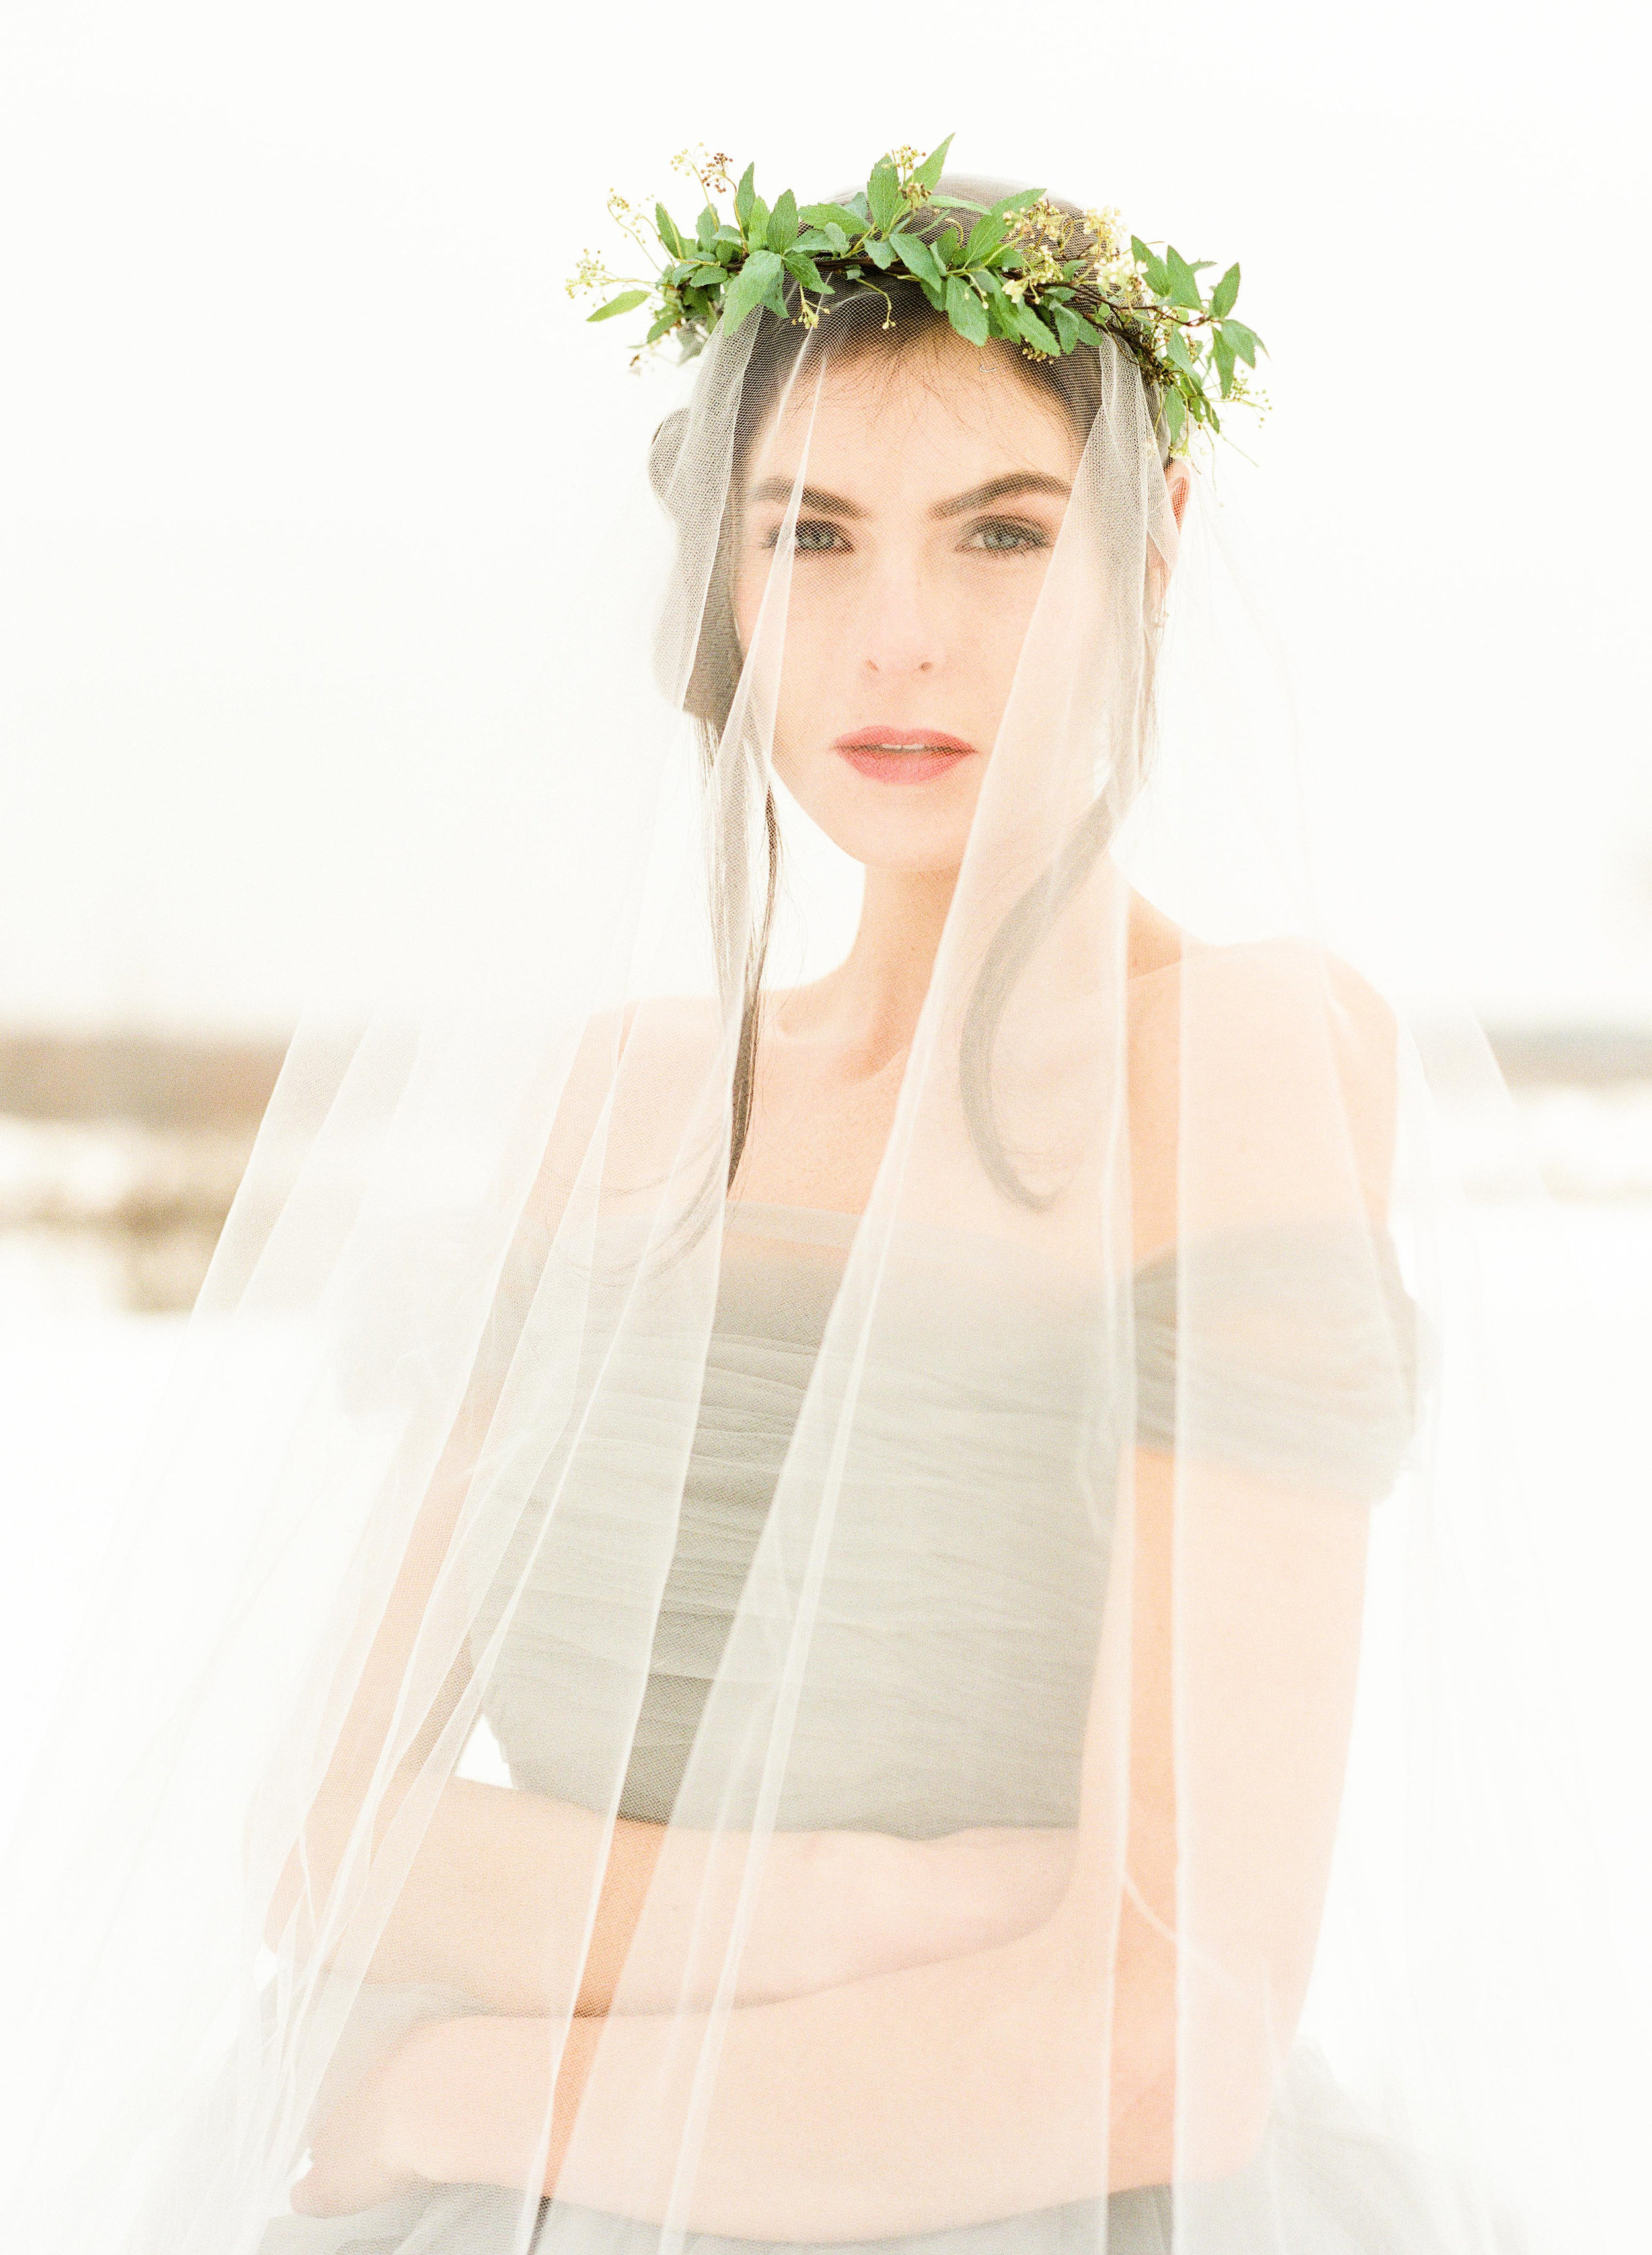 WinterEditorial-SarehNouri-LindsayMaddenPhotography-06.JPG